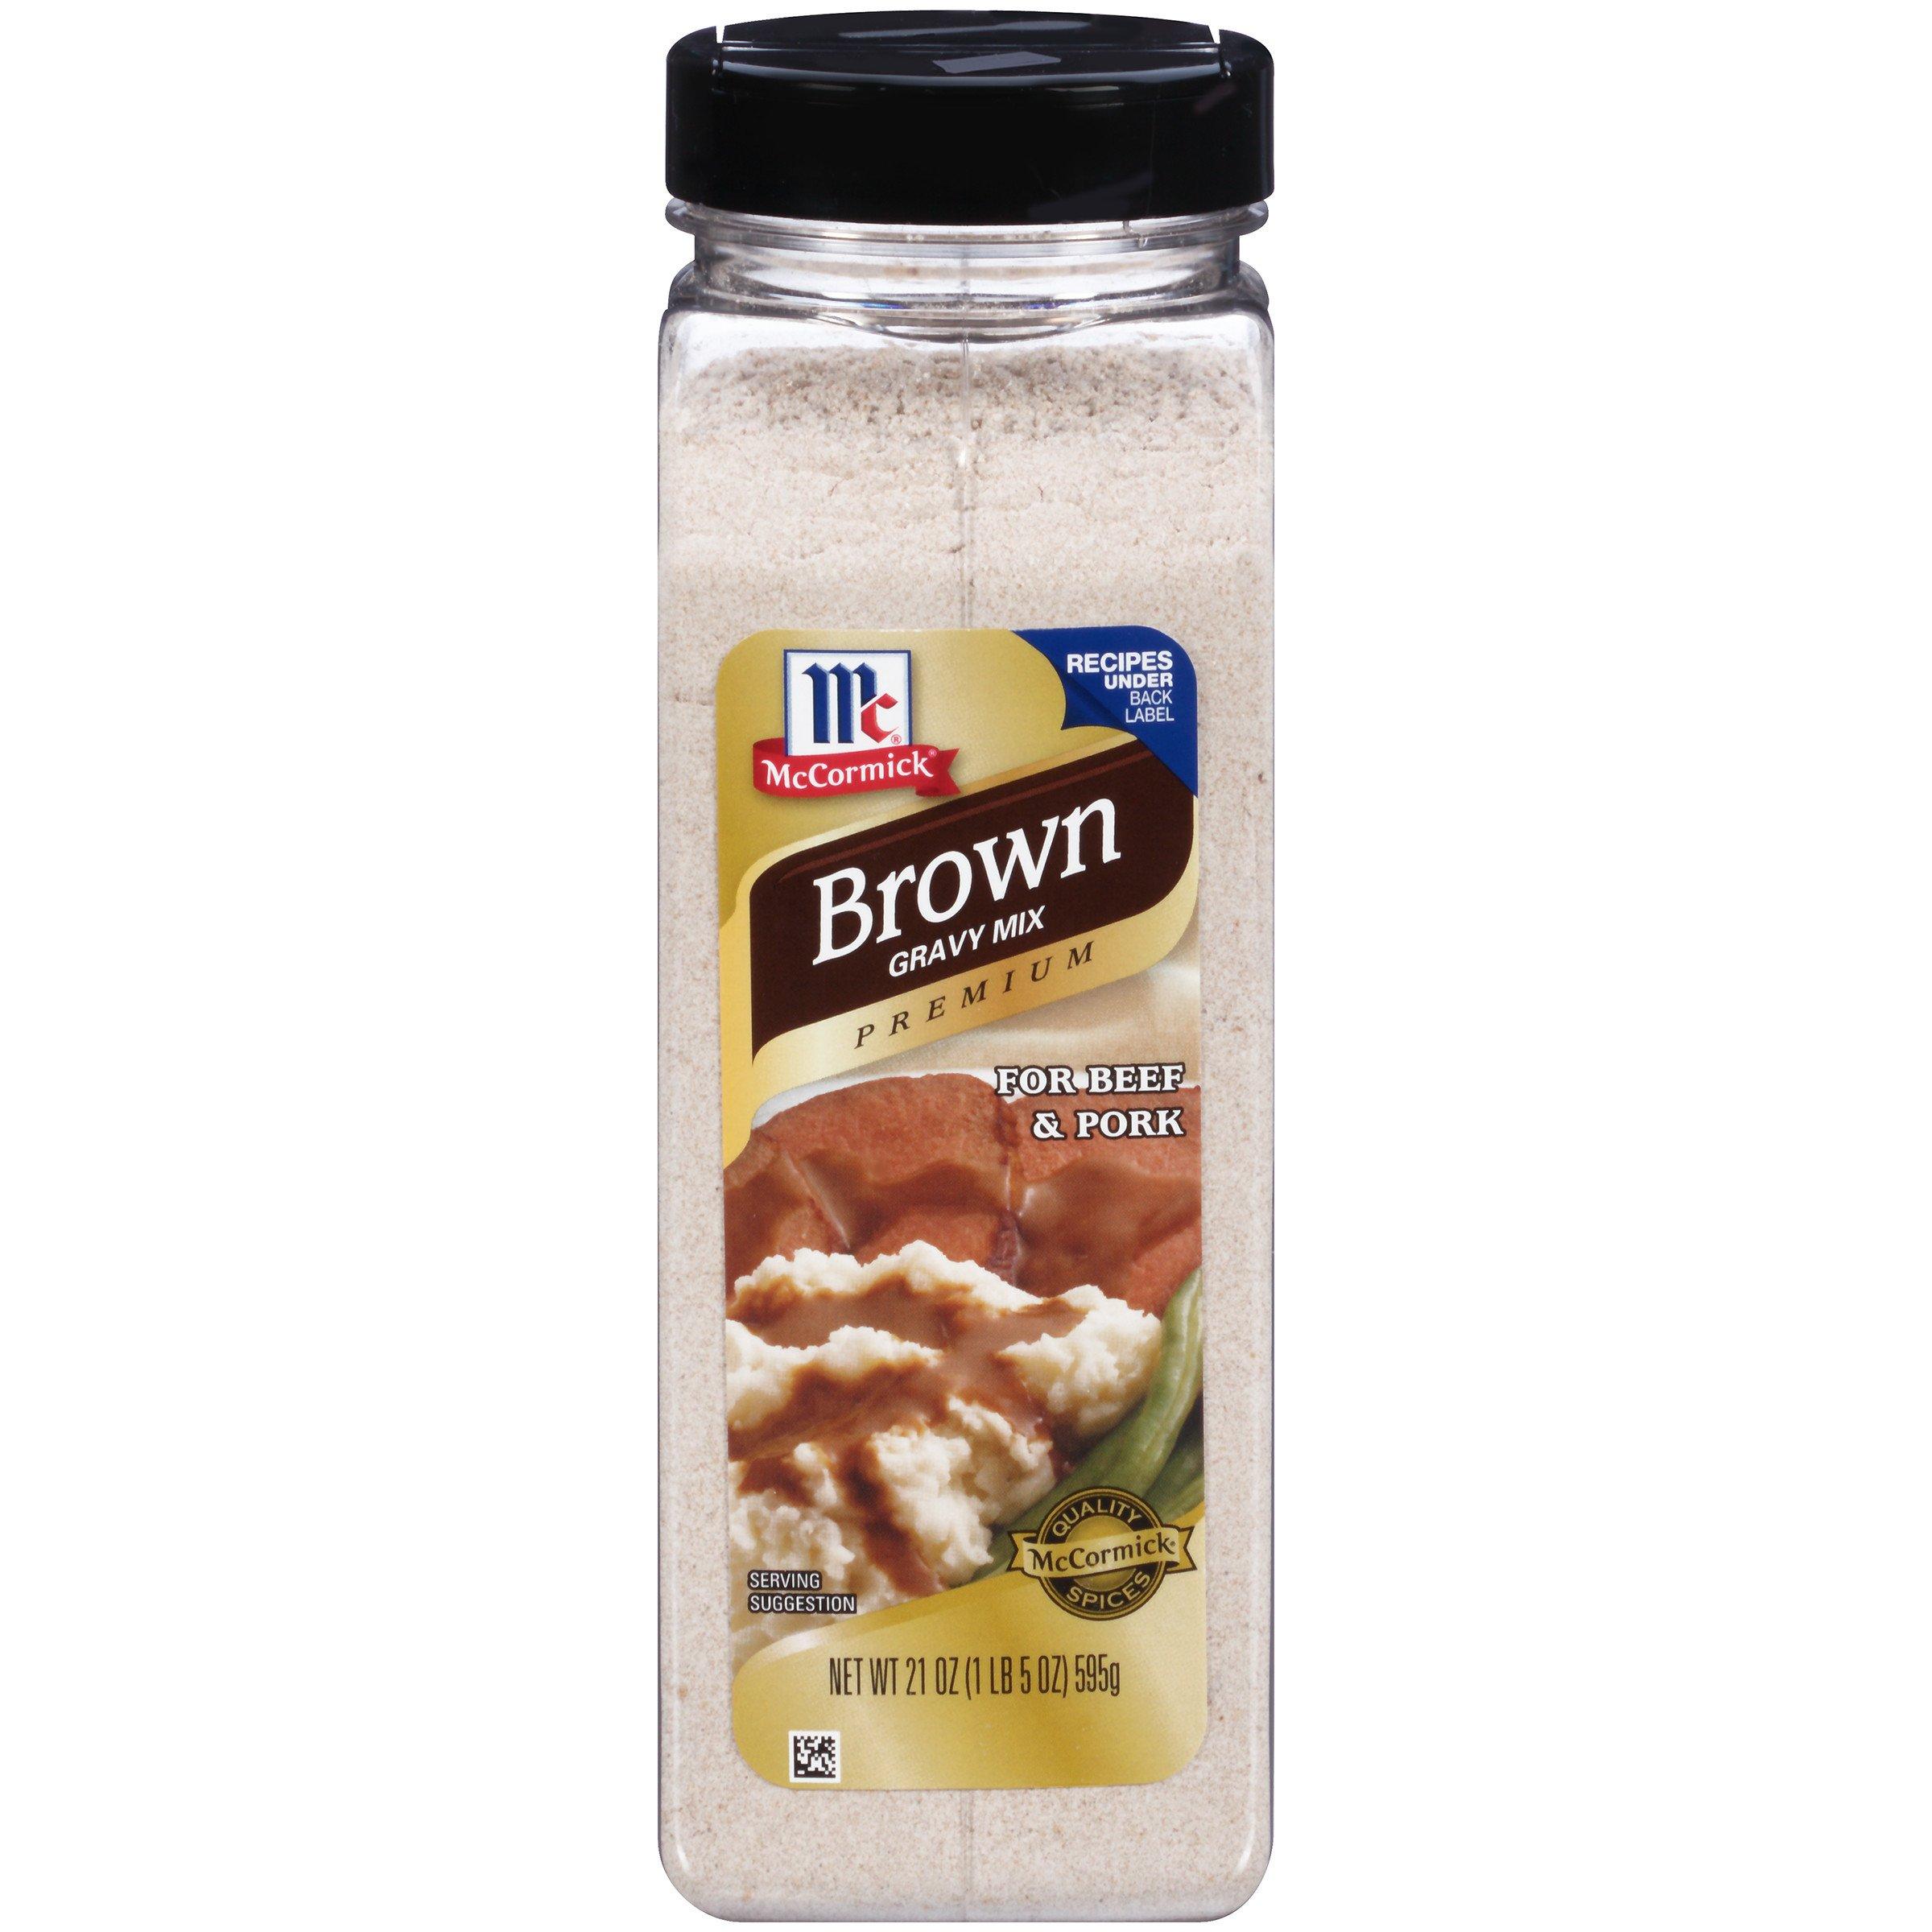 Amazon.com : Gravy Master Sauce, 1 Quart : Grocery & Gourmet Food